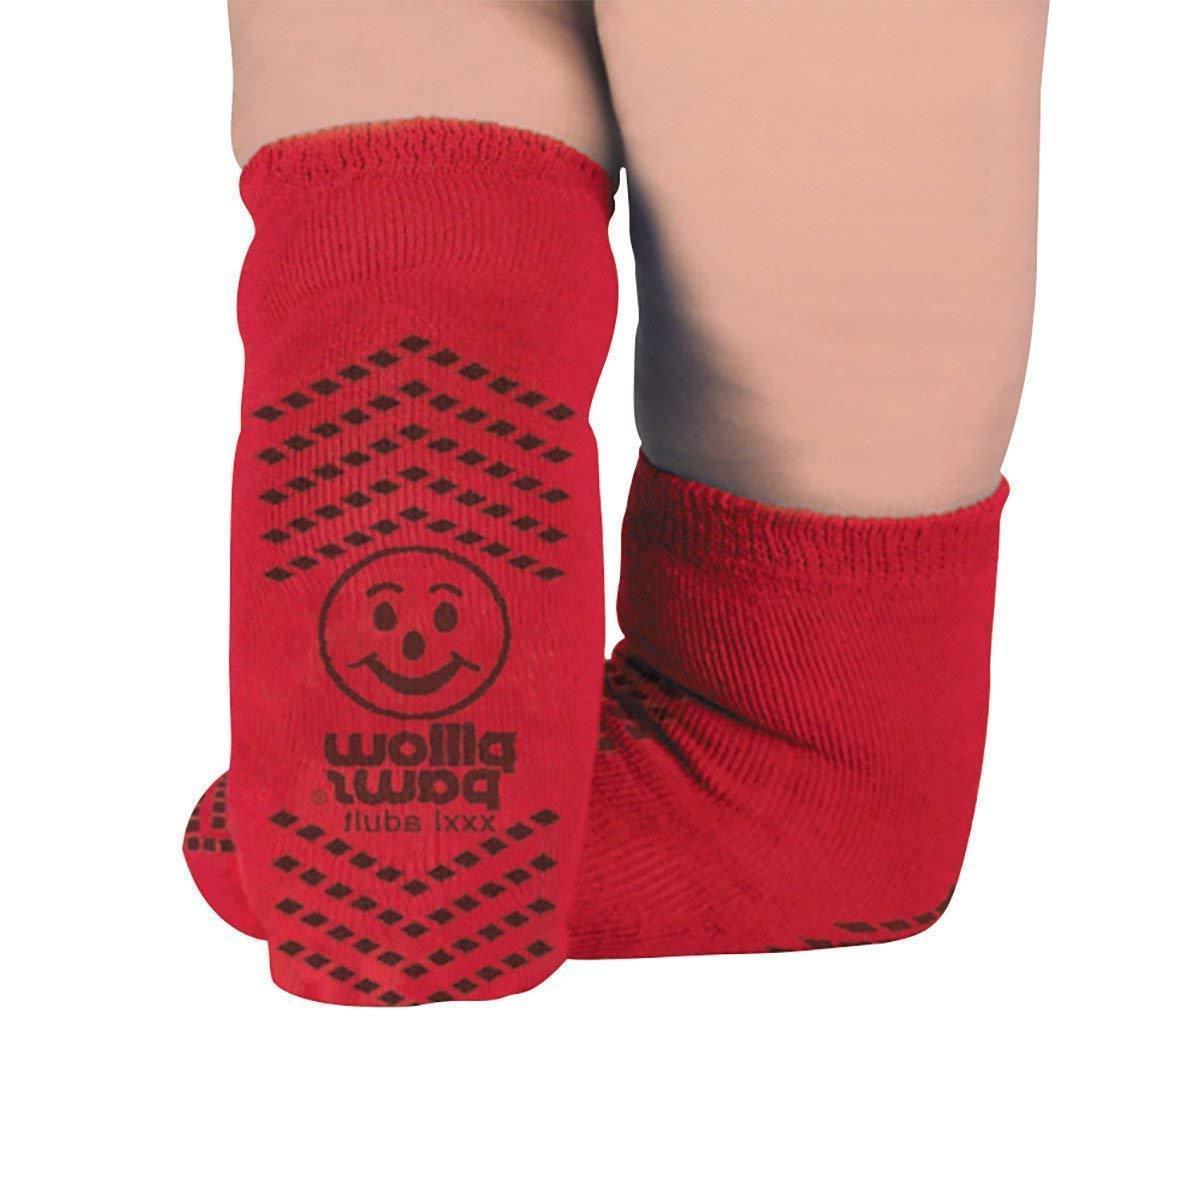 bariatric slipper socks xxxl 3xl royal blue